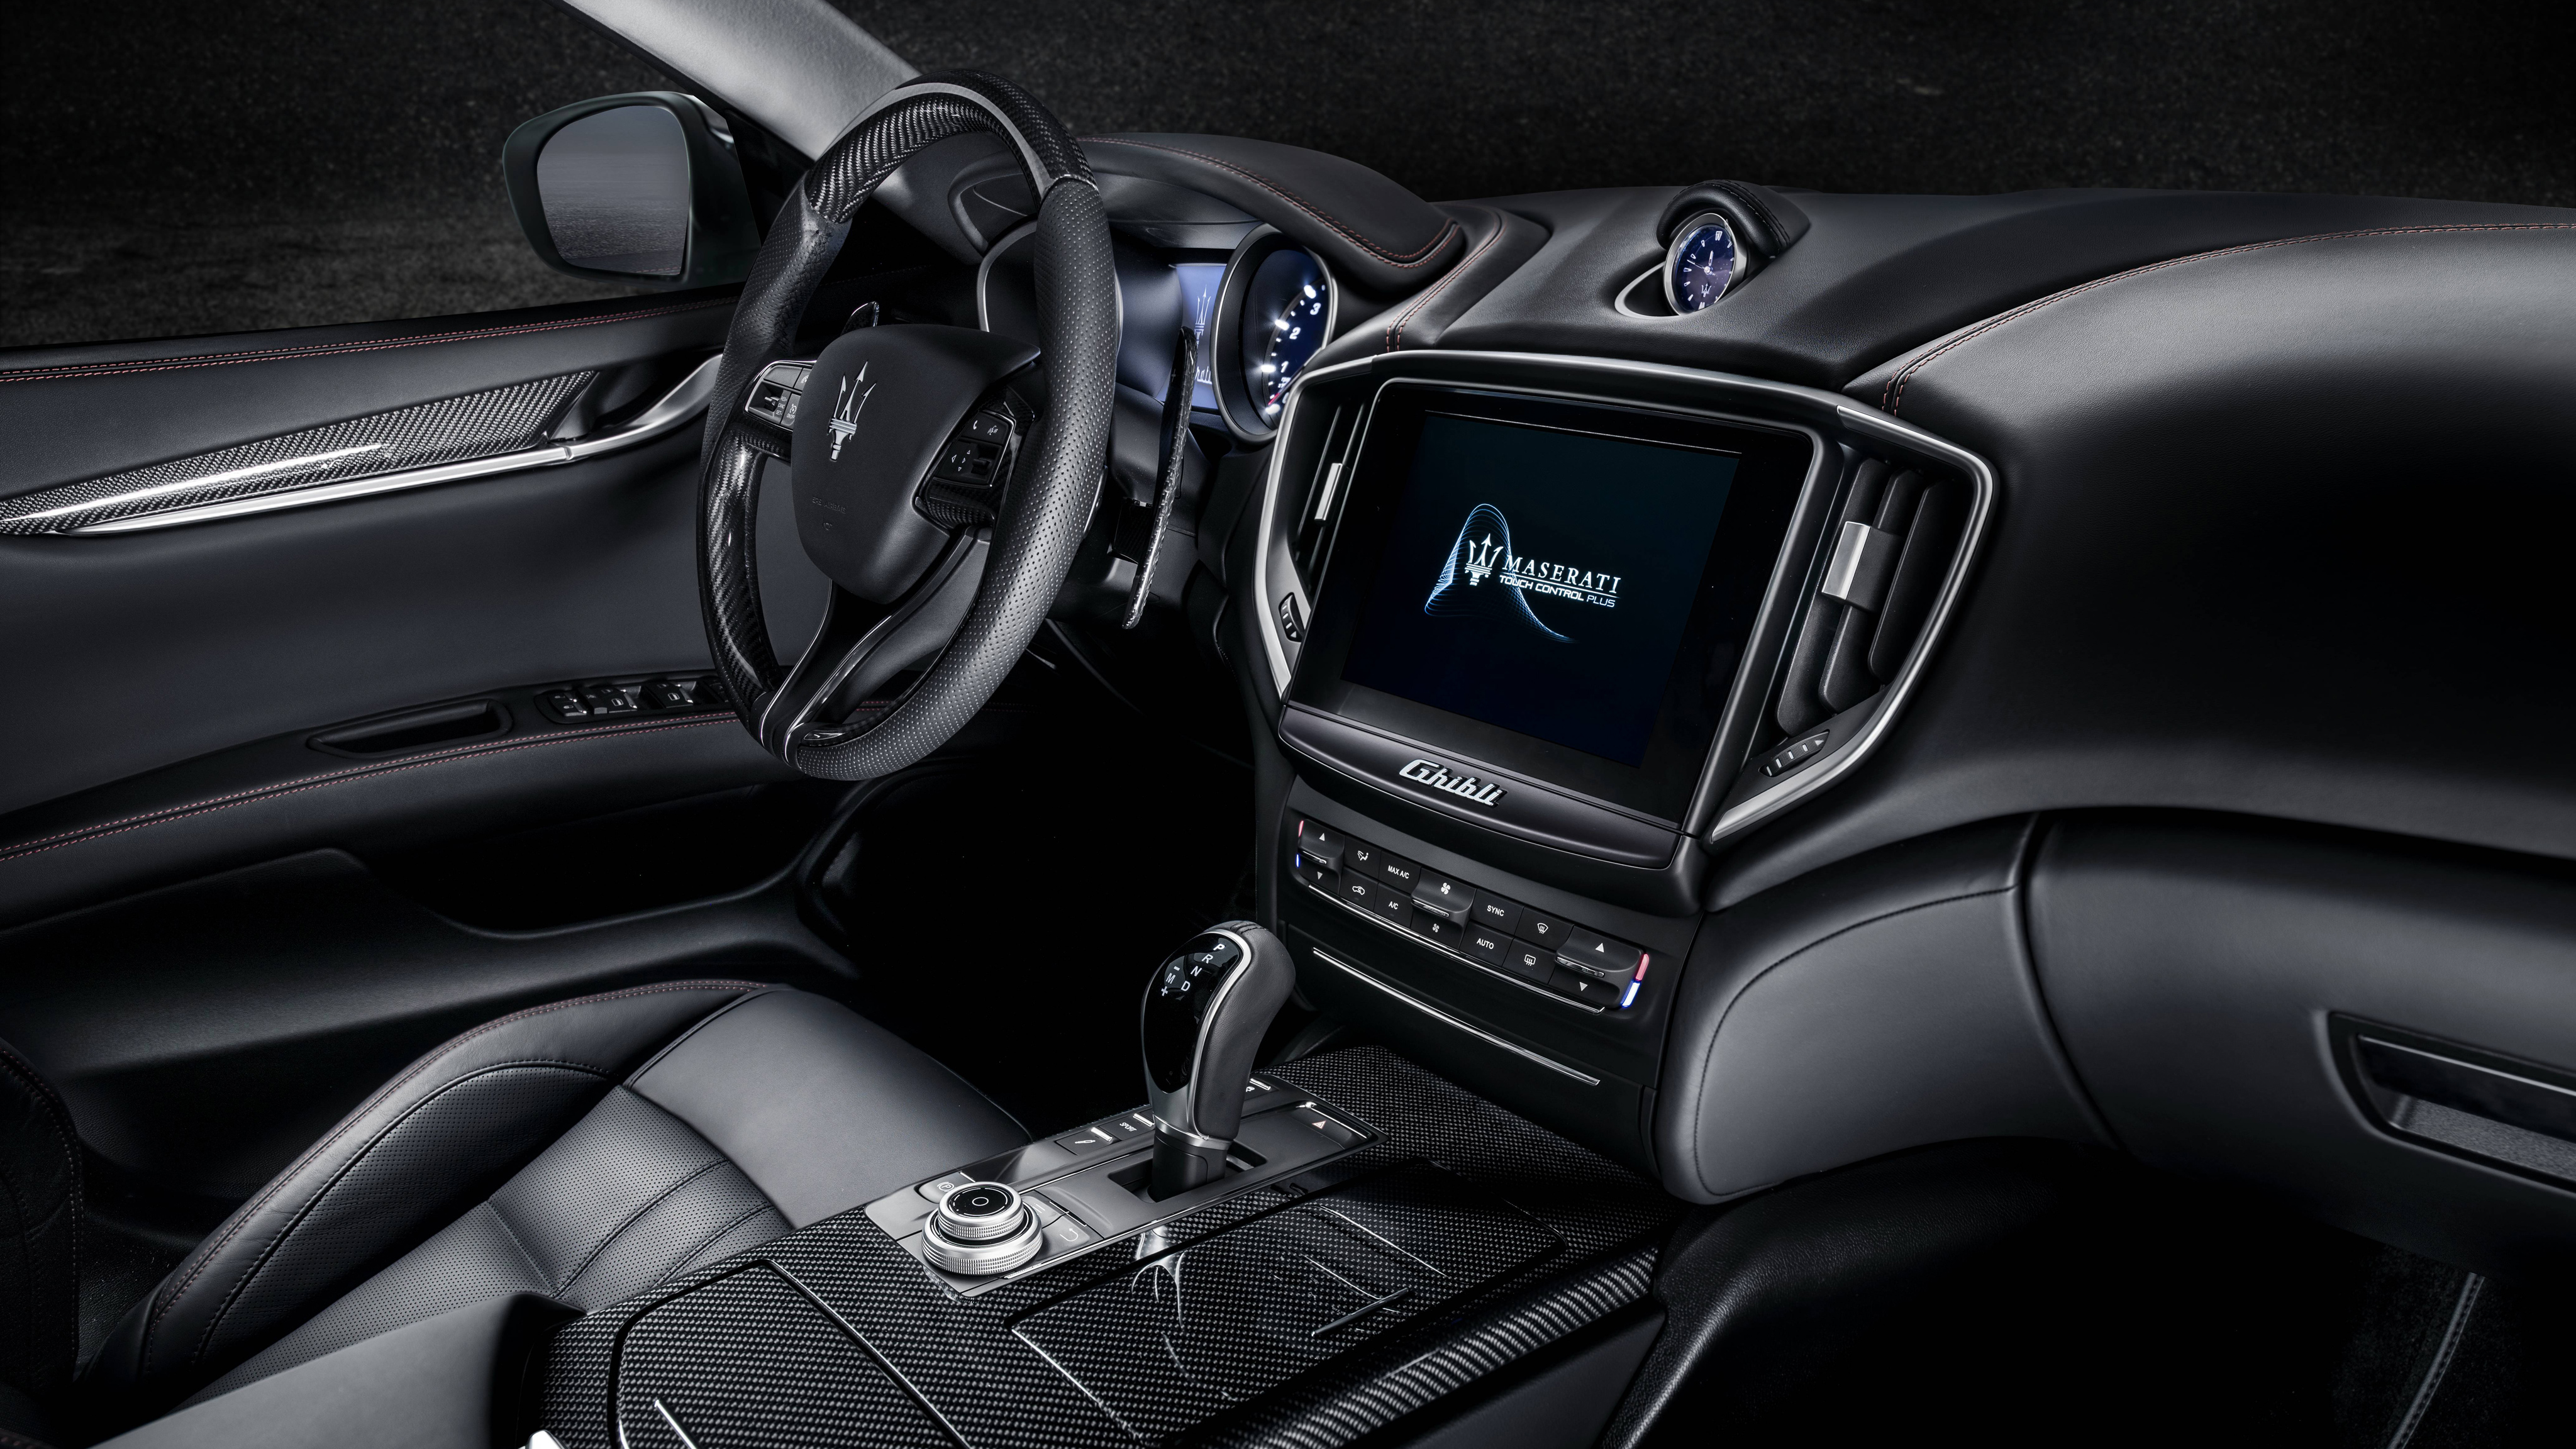 2018 Maserati Ghibli Gransport 4k Interior Wallpaper Hd Car